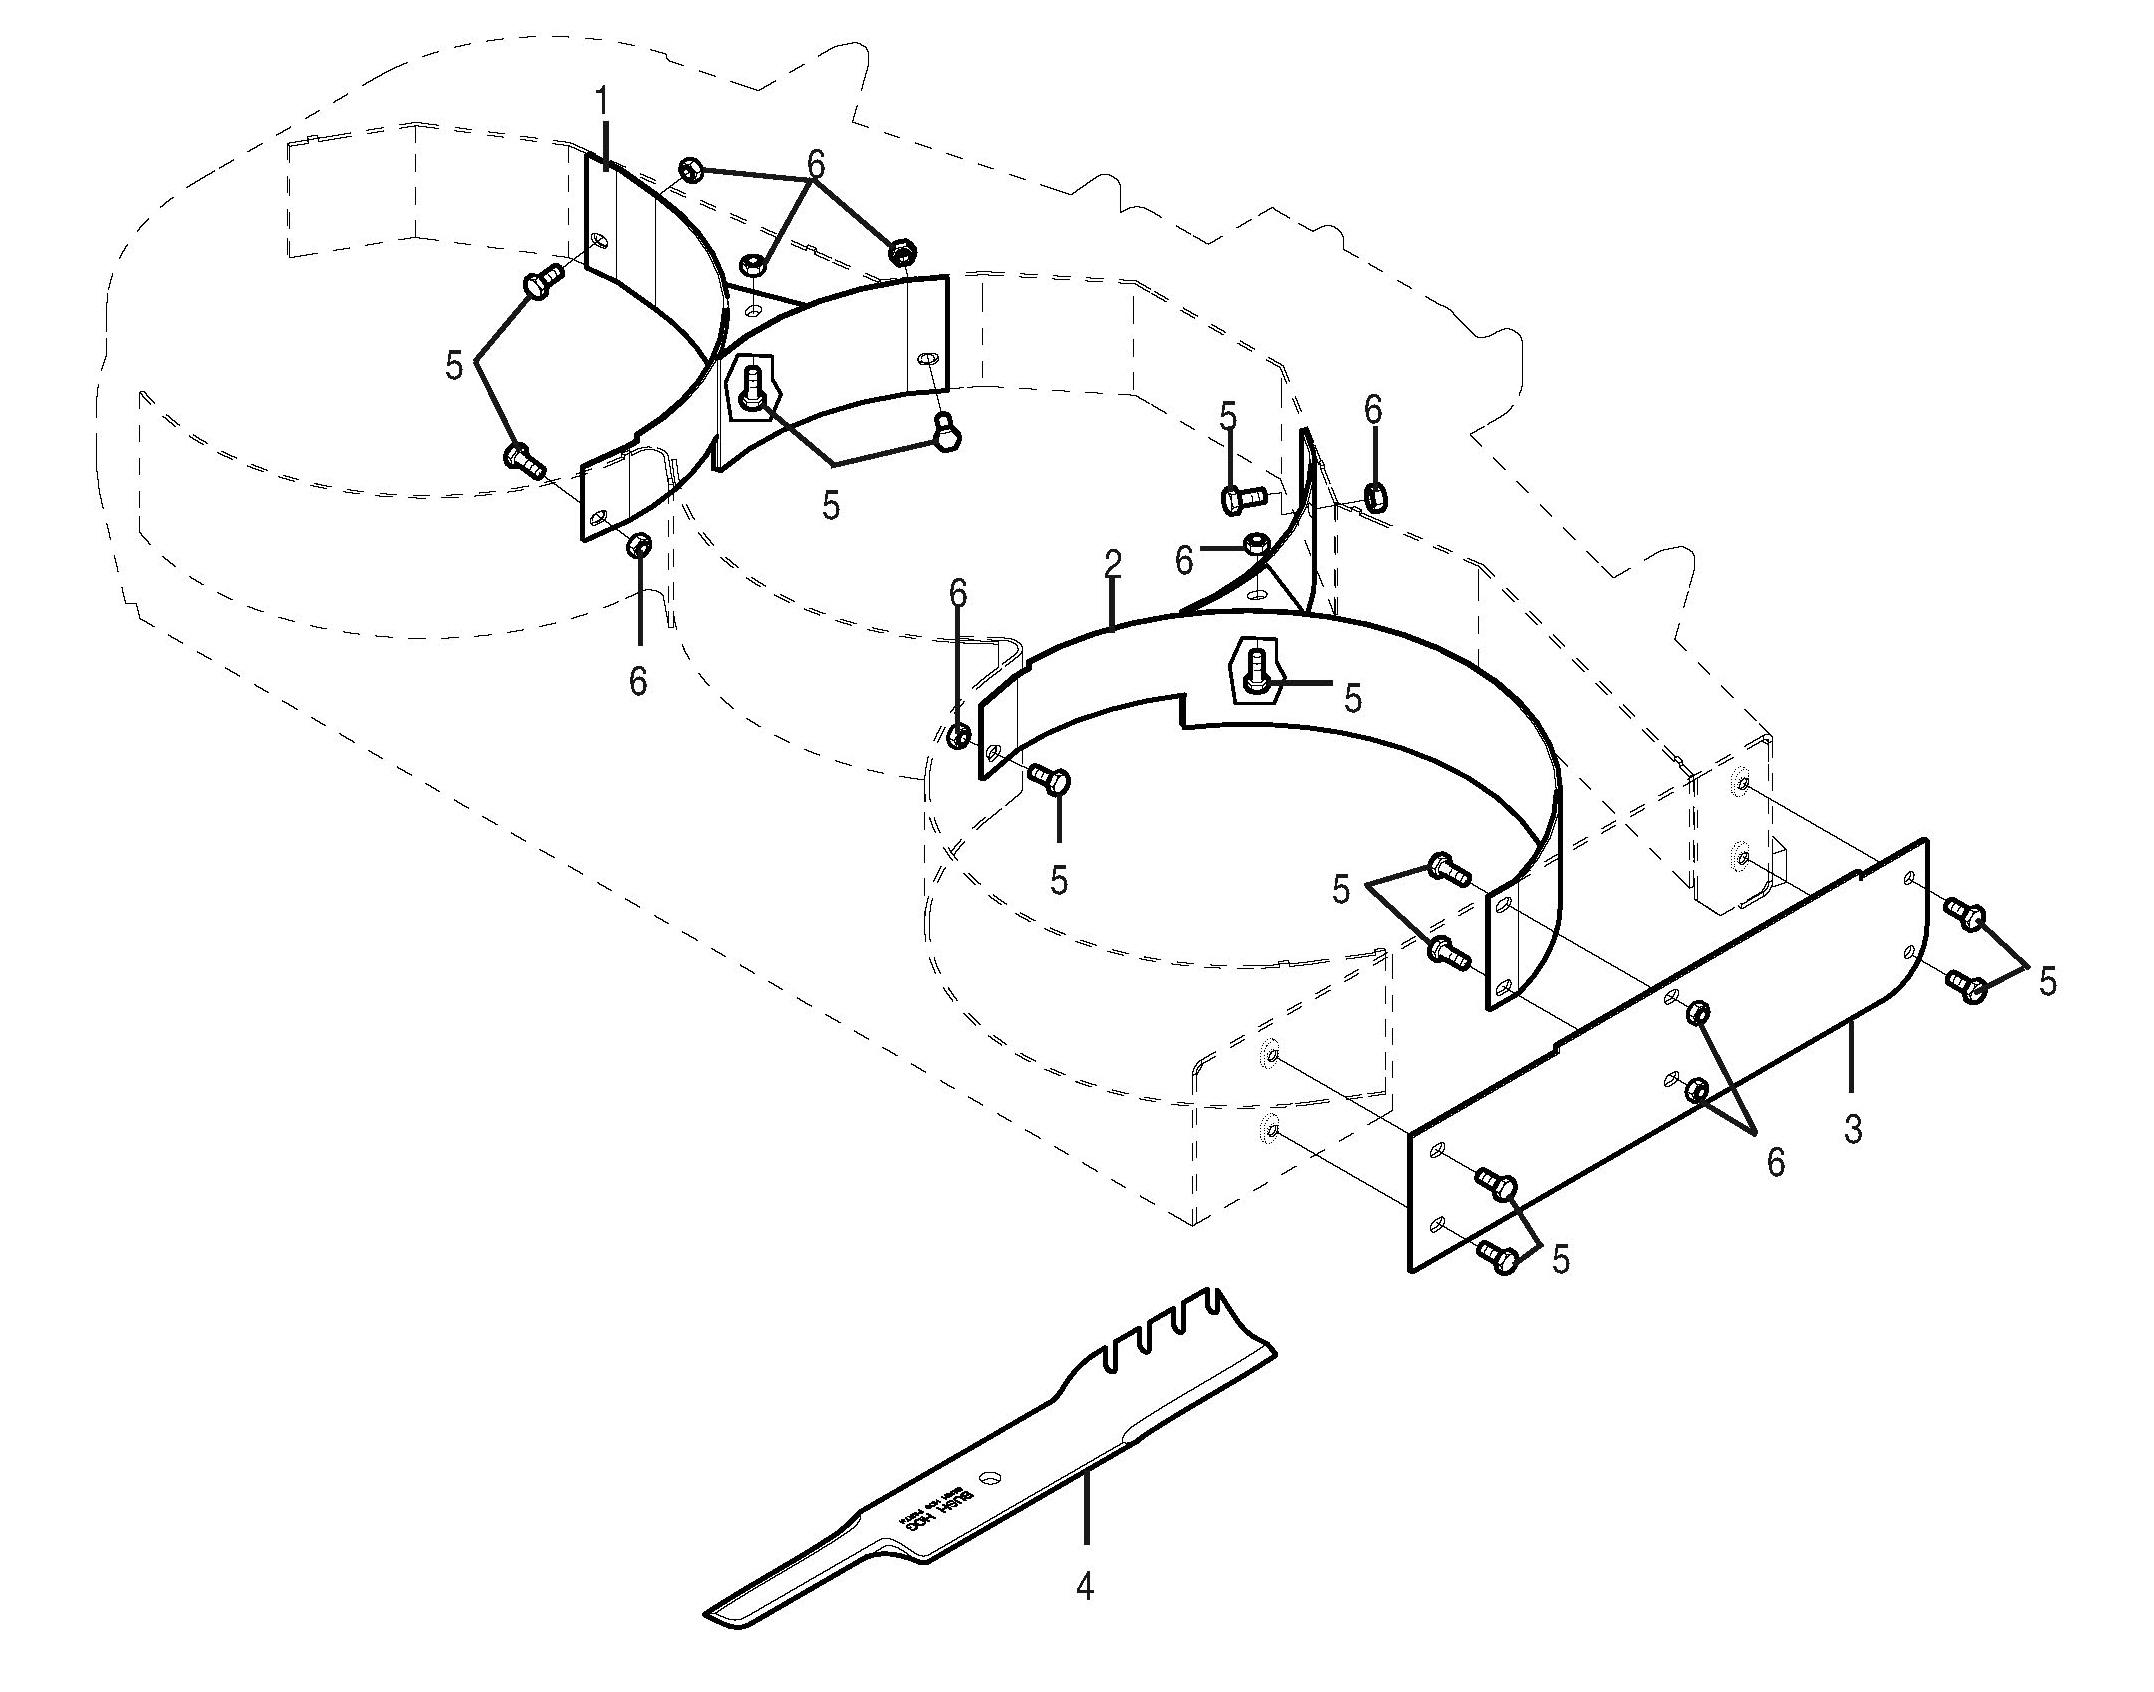 Bush Diagram Hog Es1844 - Online Schematic Diagram •